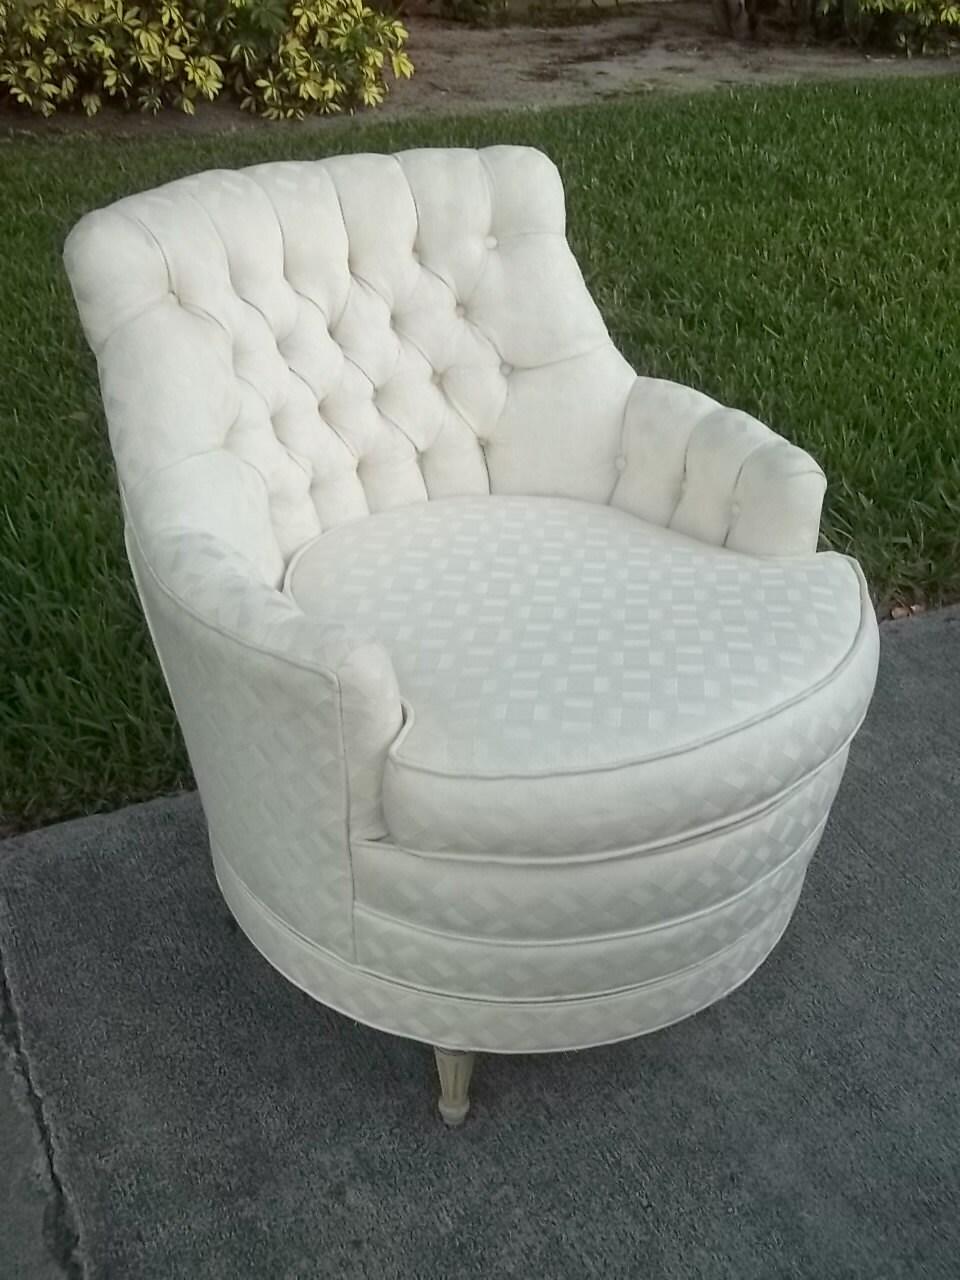 Cute Cupcake Chair Gorgeous White Vintage Tufted Tub Swivel